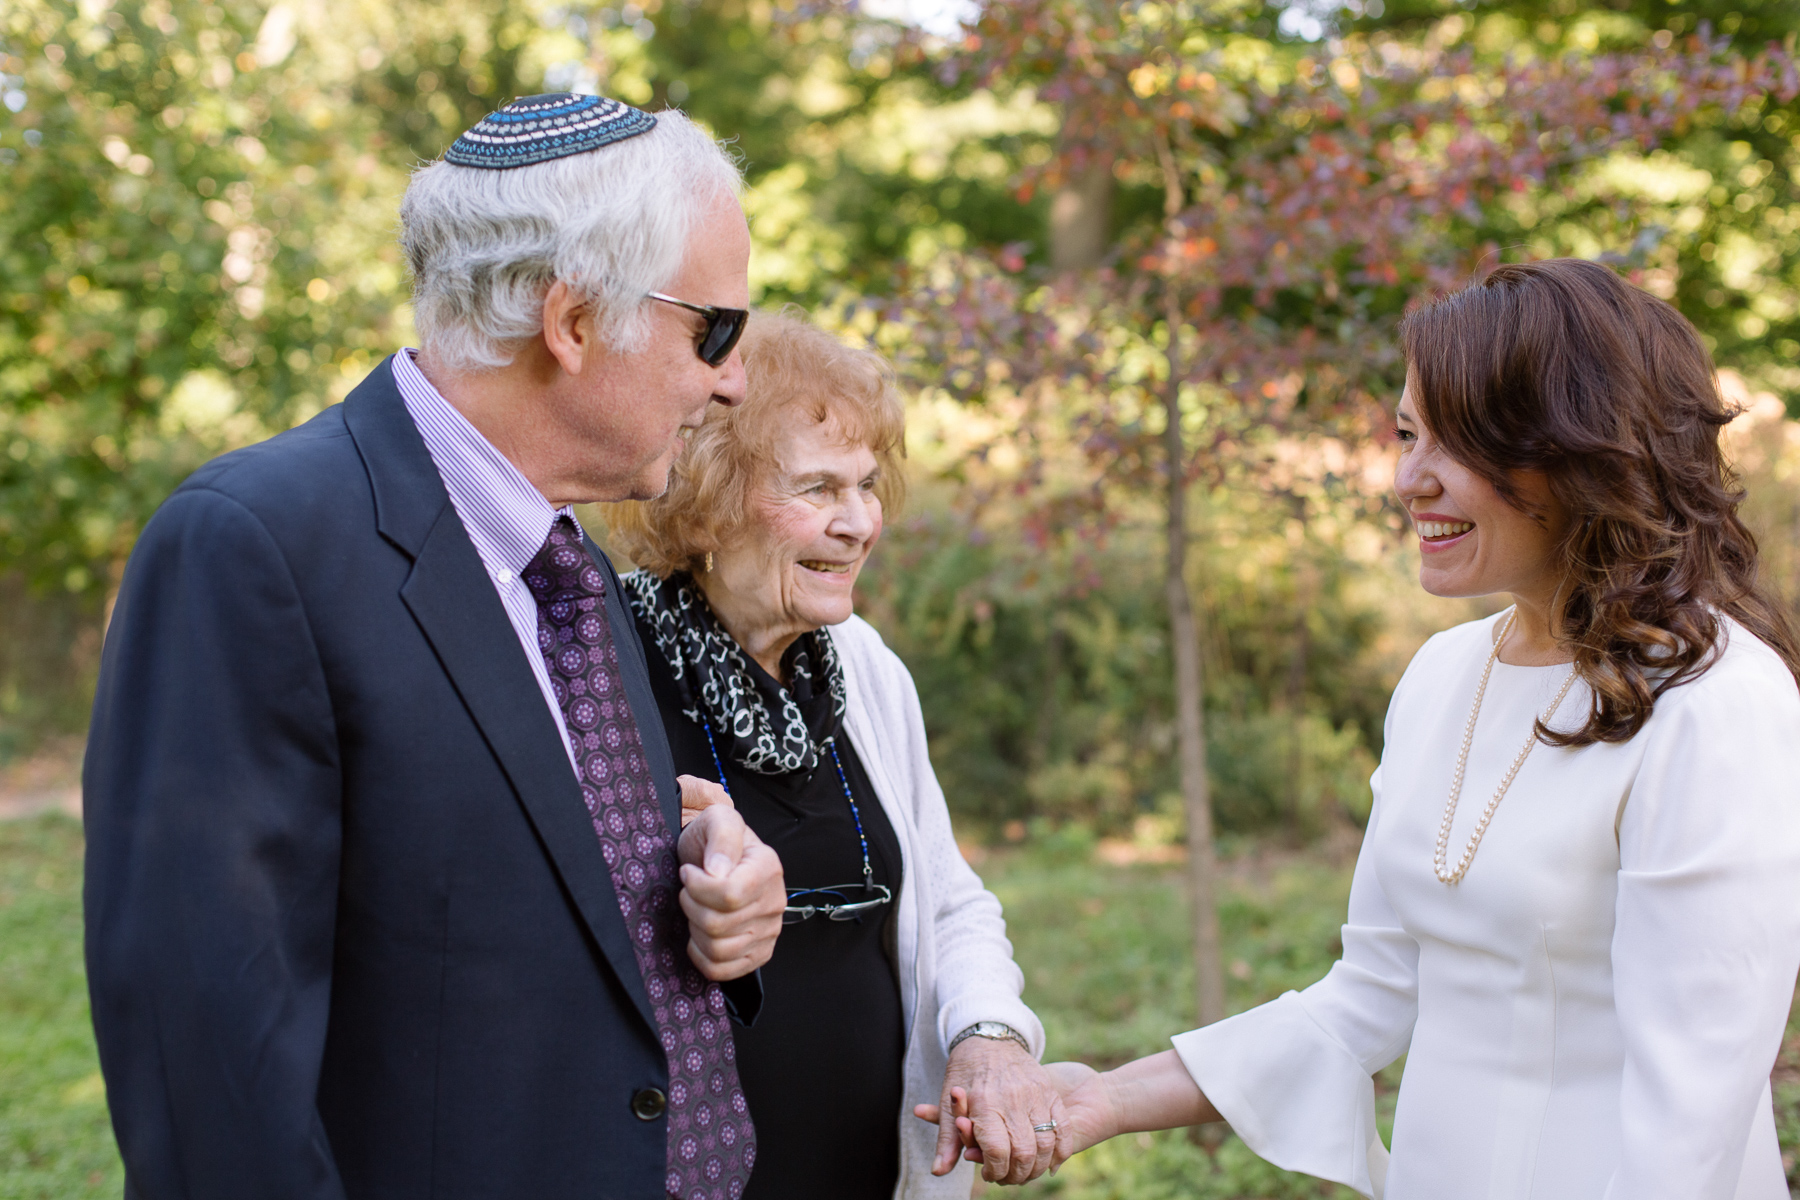 prospect park wedding ceremony